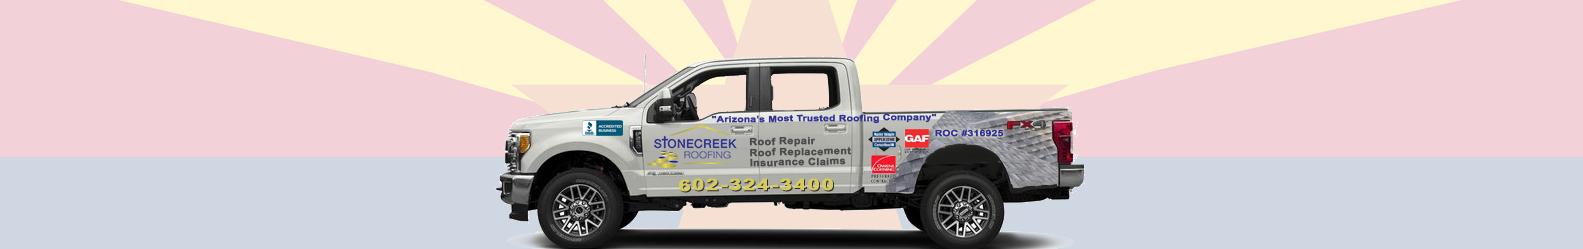 About Stonecreek Roofing in Arizona | Phoenix, AZ Roofers